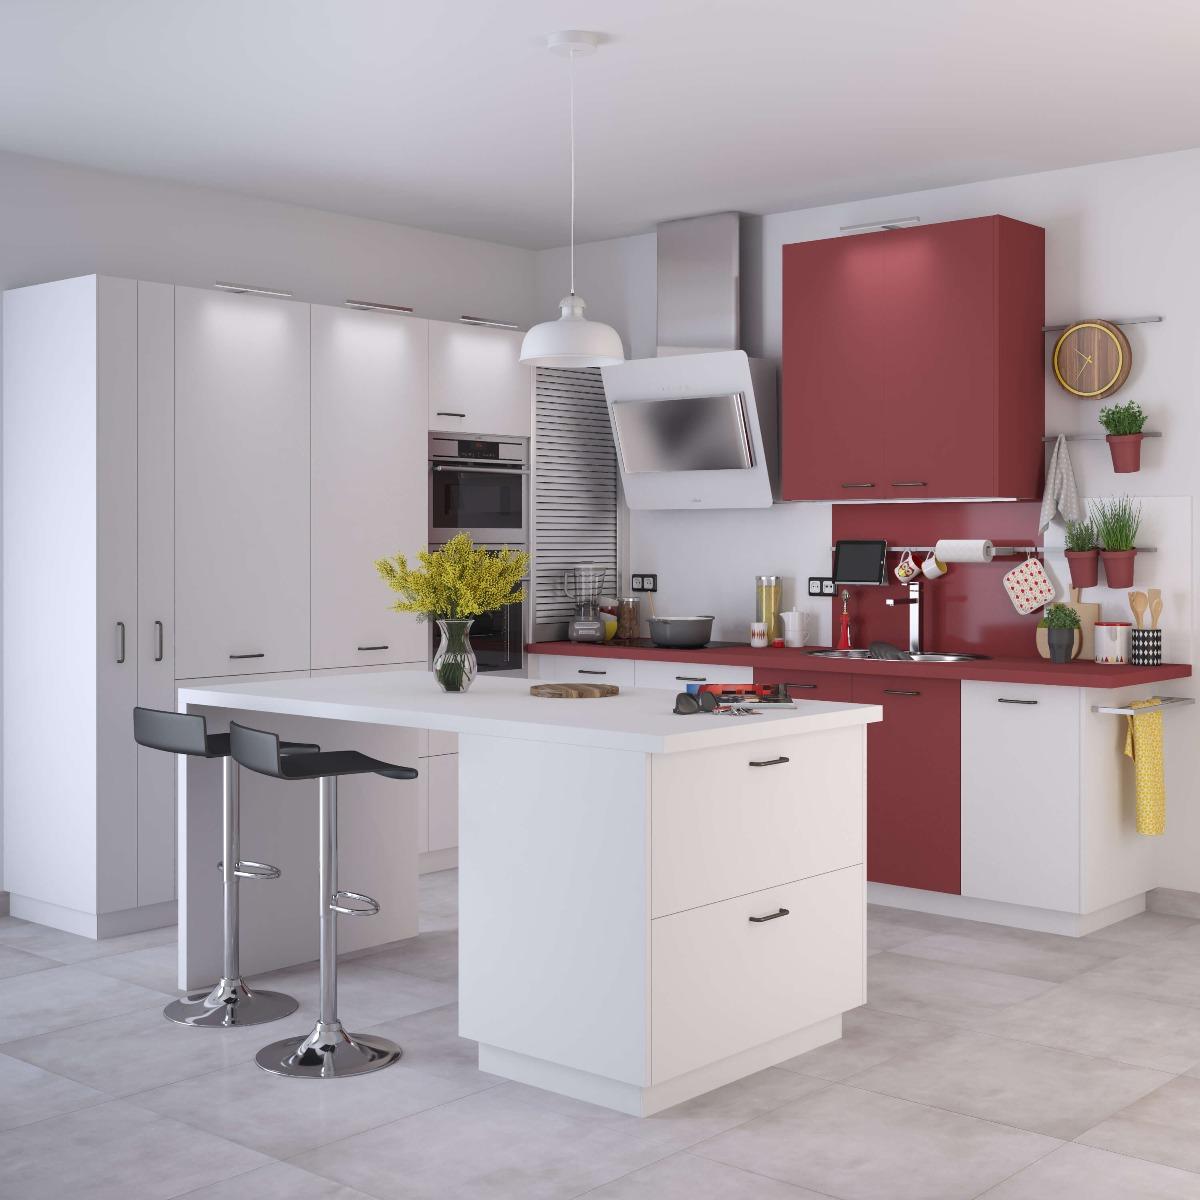 Delinia Sofia Red Designer Kitchen Mobi - Example 2